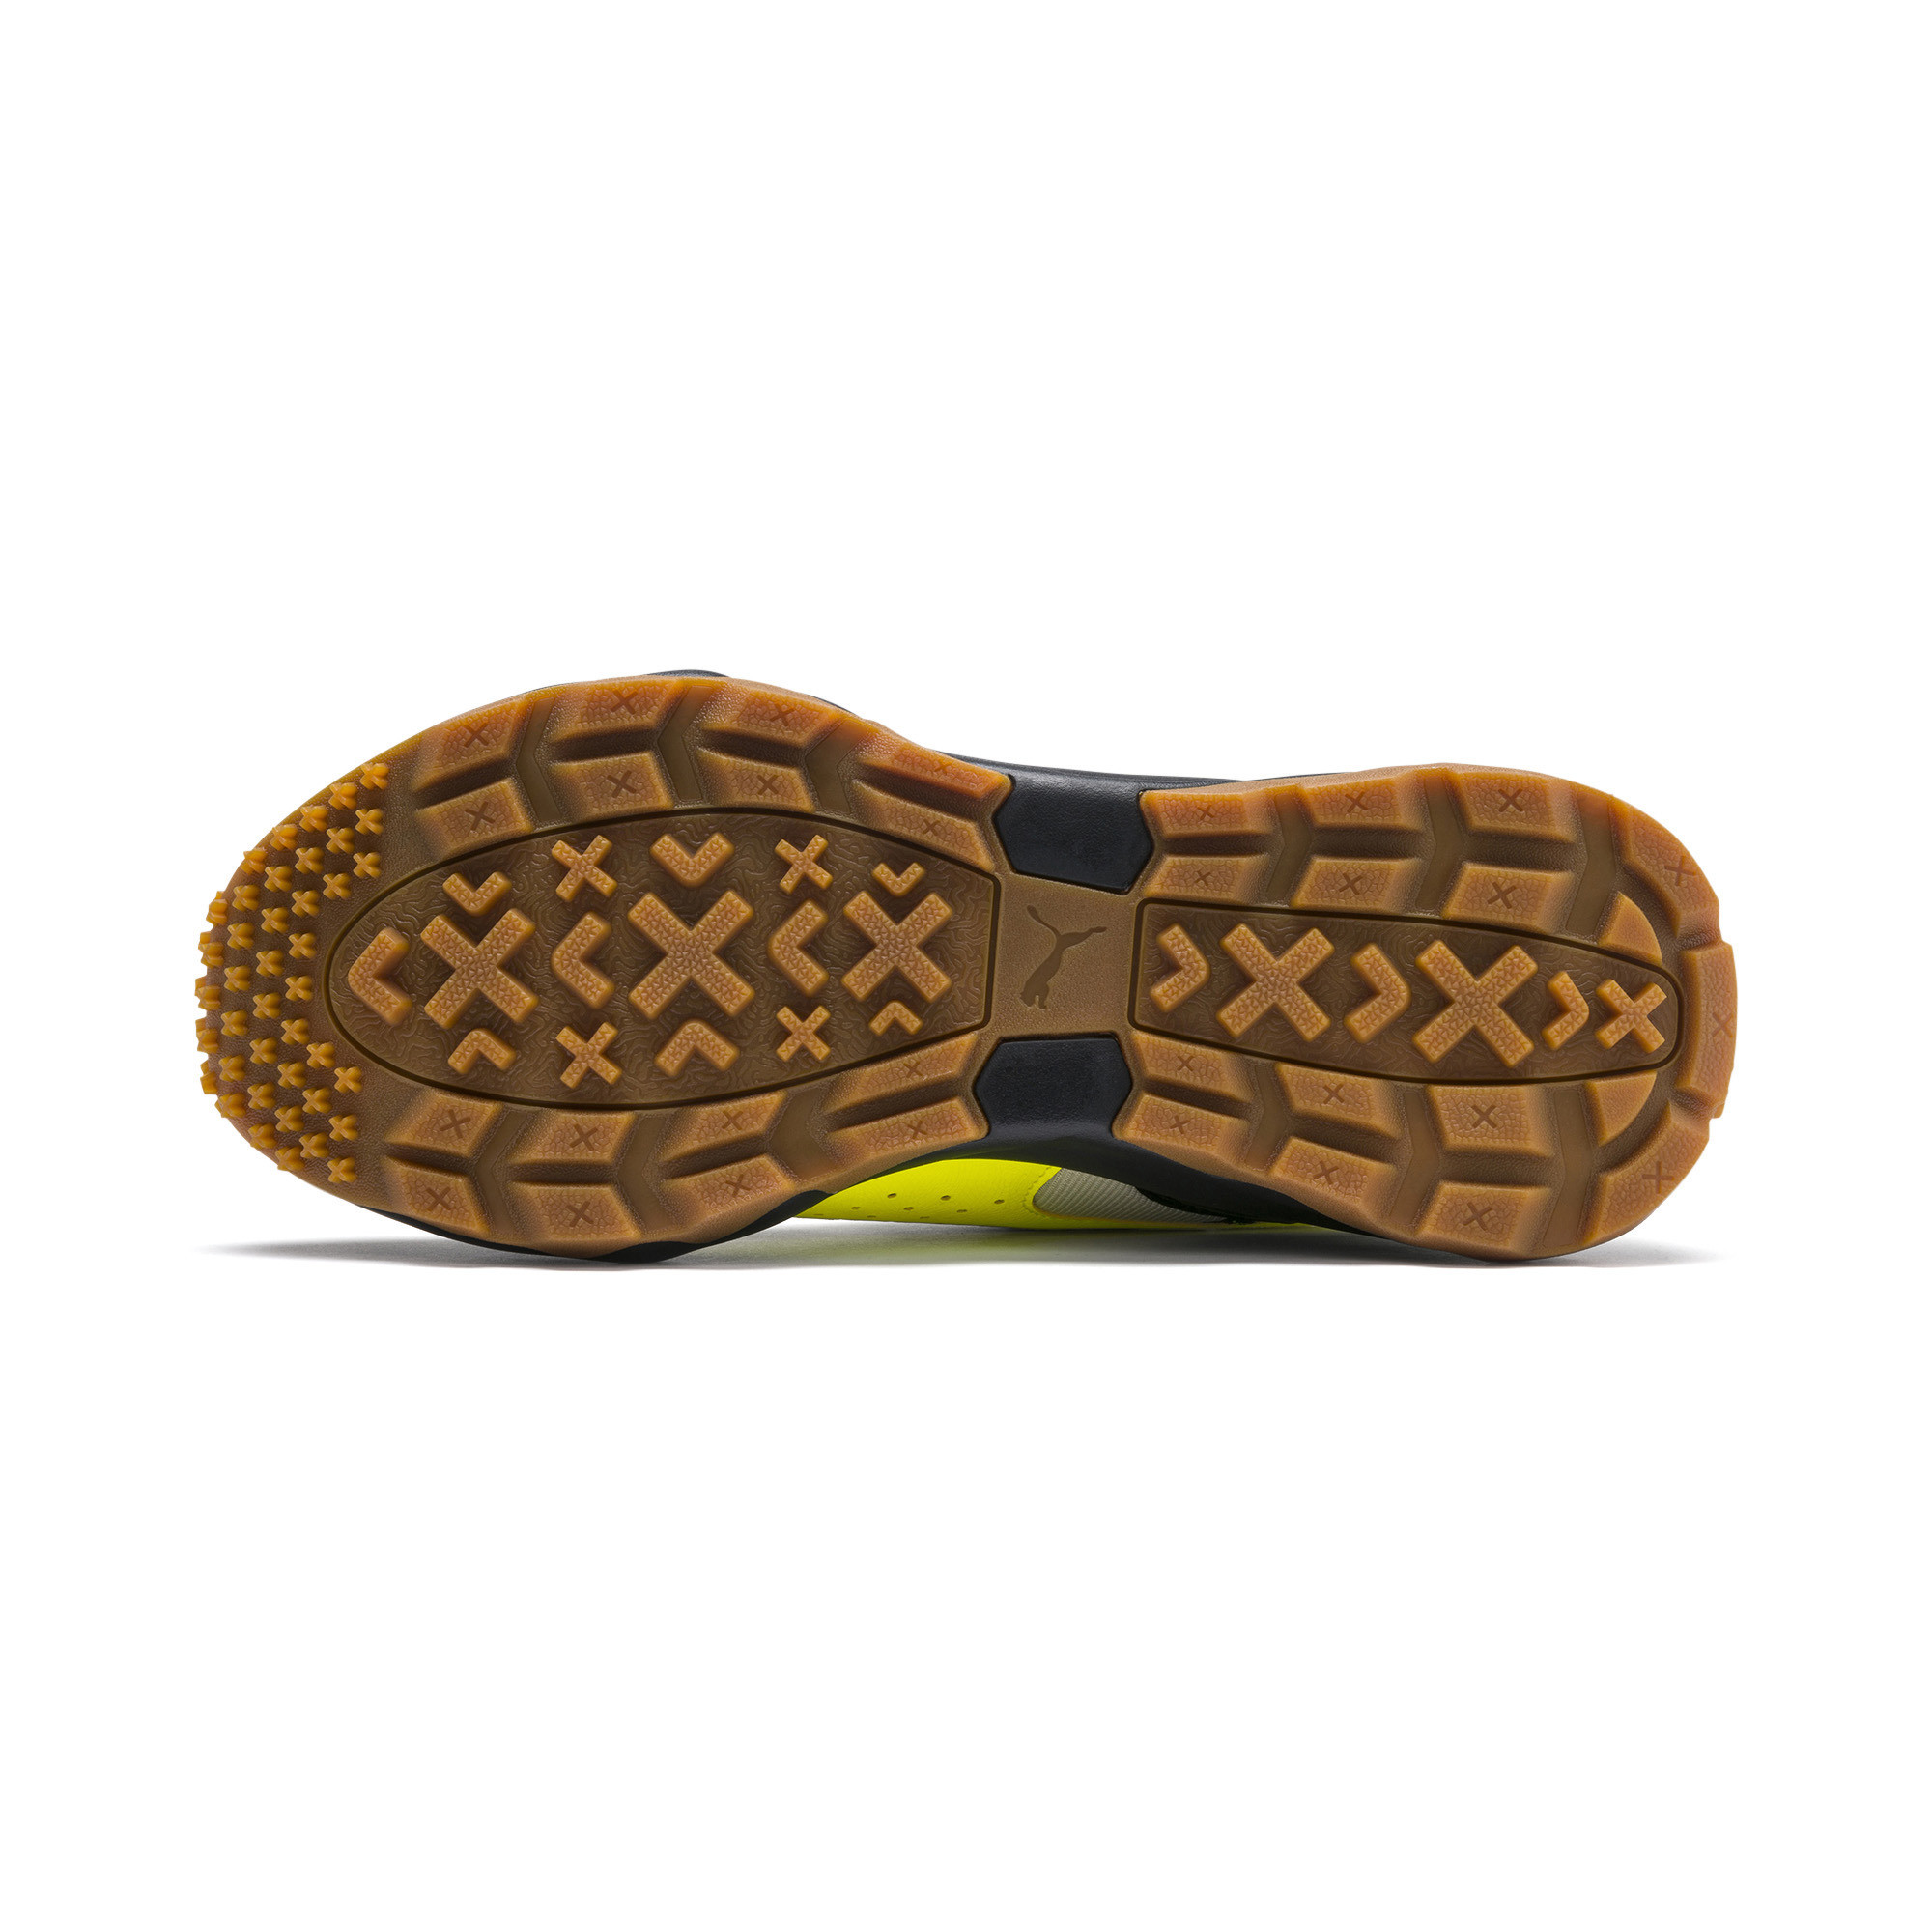 PUMA-Ember-Trail-Men-s-Running-Shoes-Men-Shoe-Running thumbnail 5